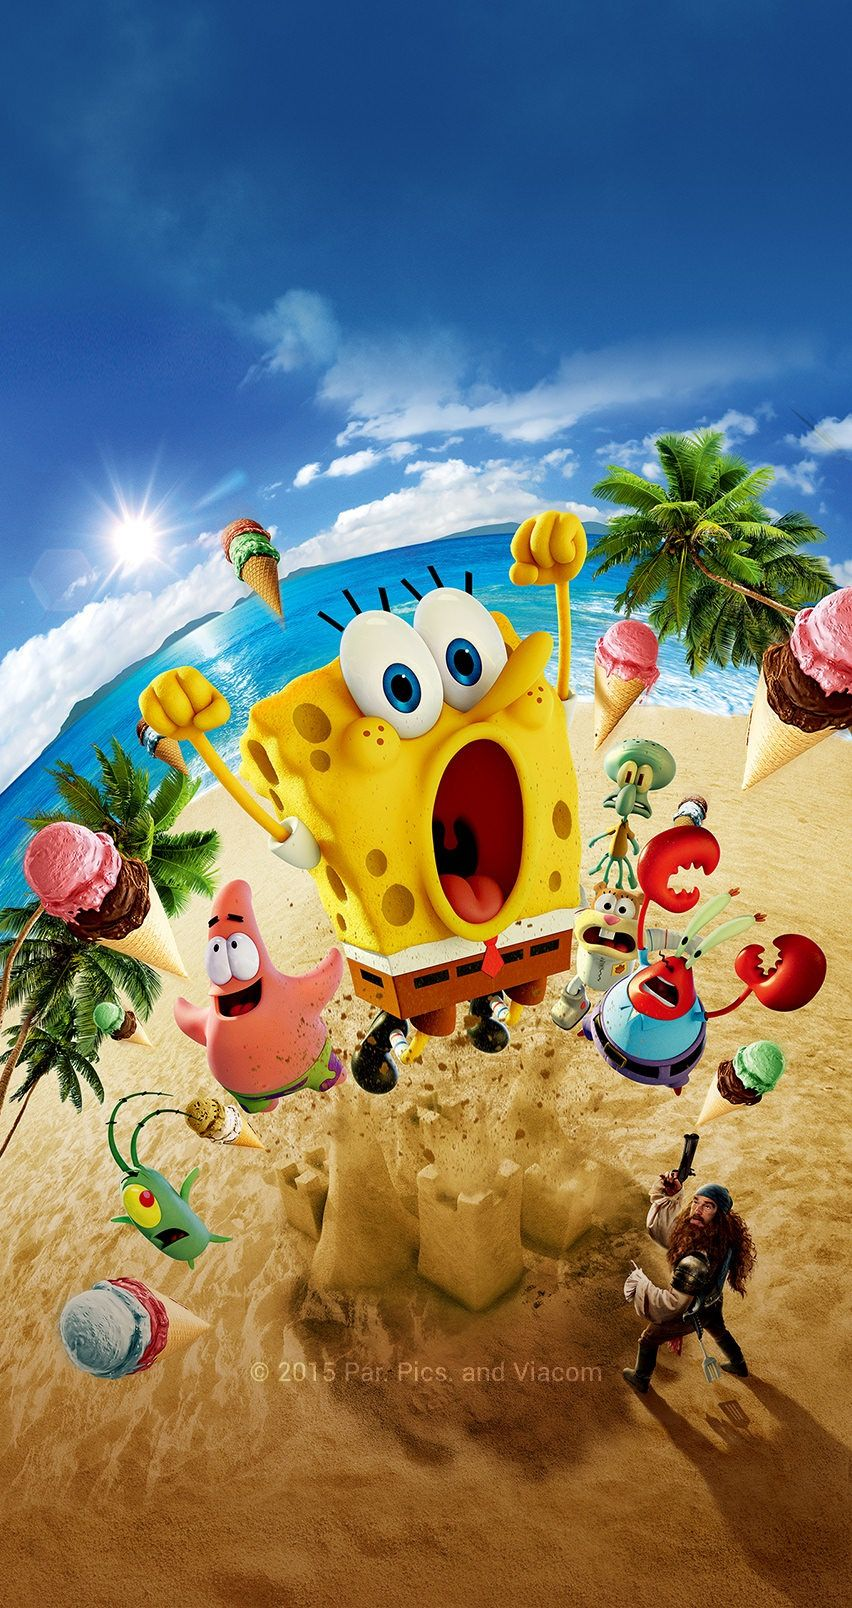 Pin By Oum 彡 On Bg Wallpaper Pattern Spongebob Iphone Wallpaper Spongebob Wallpaper Cartoon Wallpaper Iphone